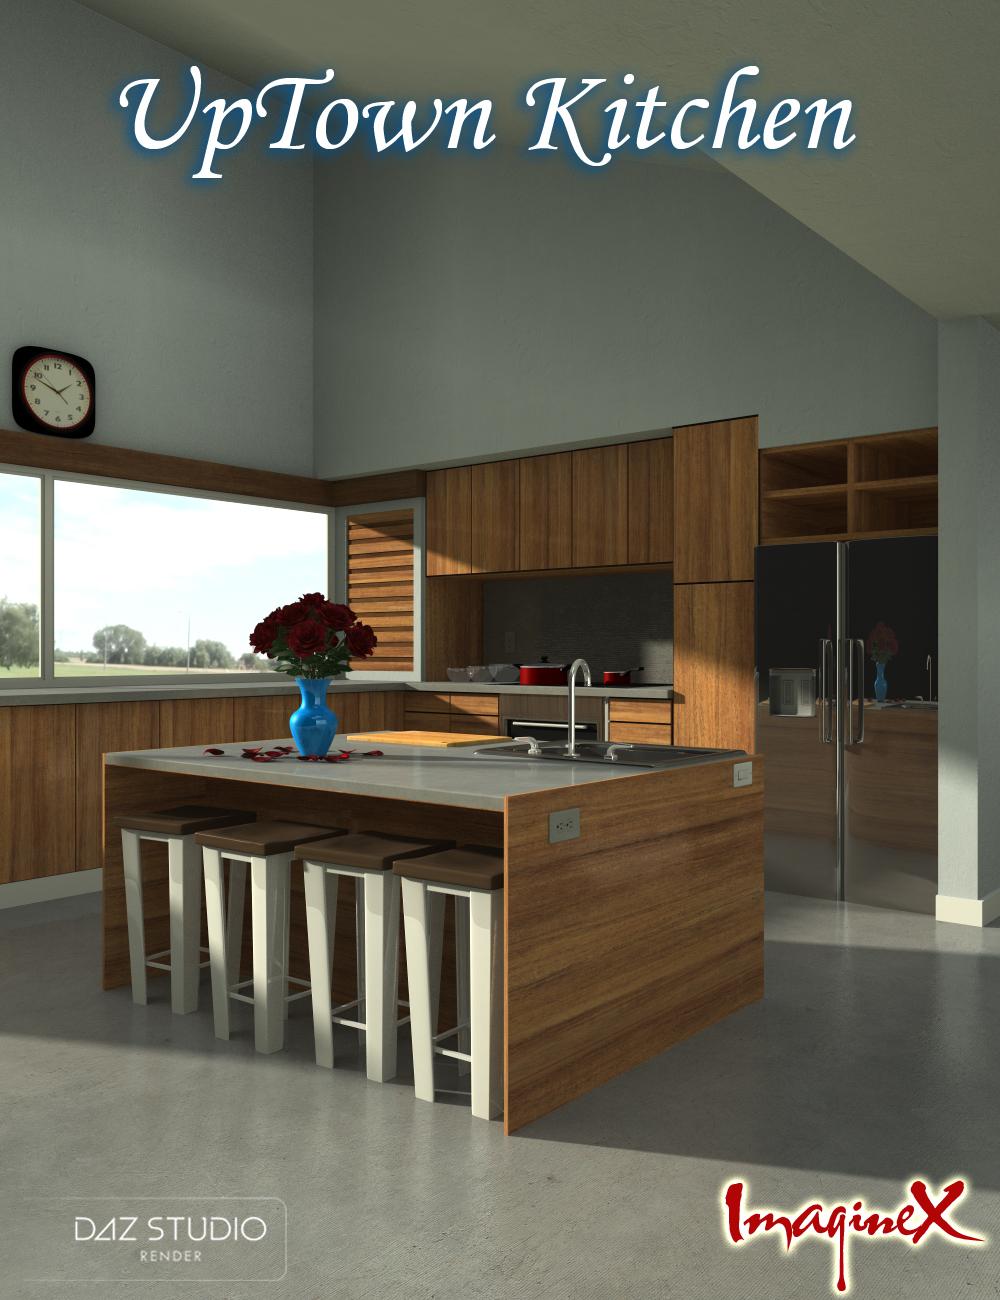 Up Town Kitchen by: ImagineX, 3D Models by Daz 3D